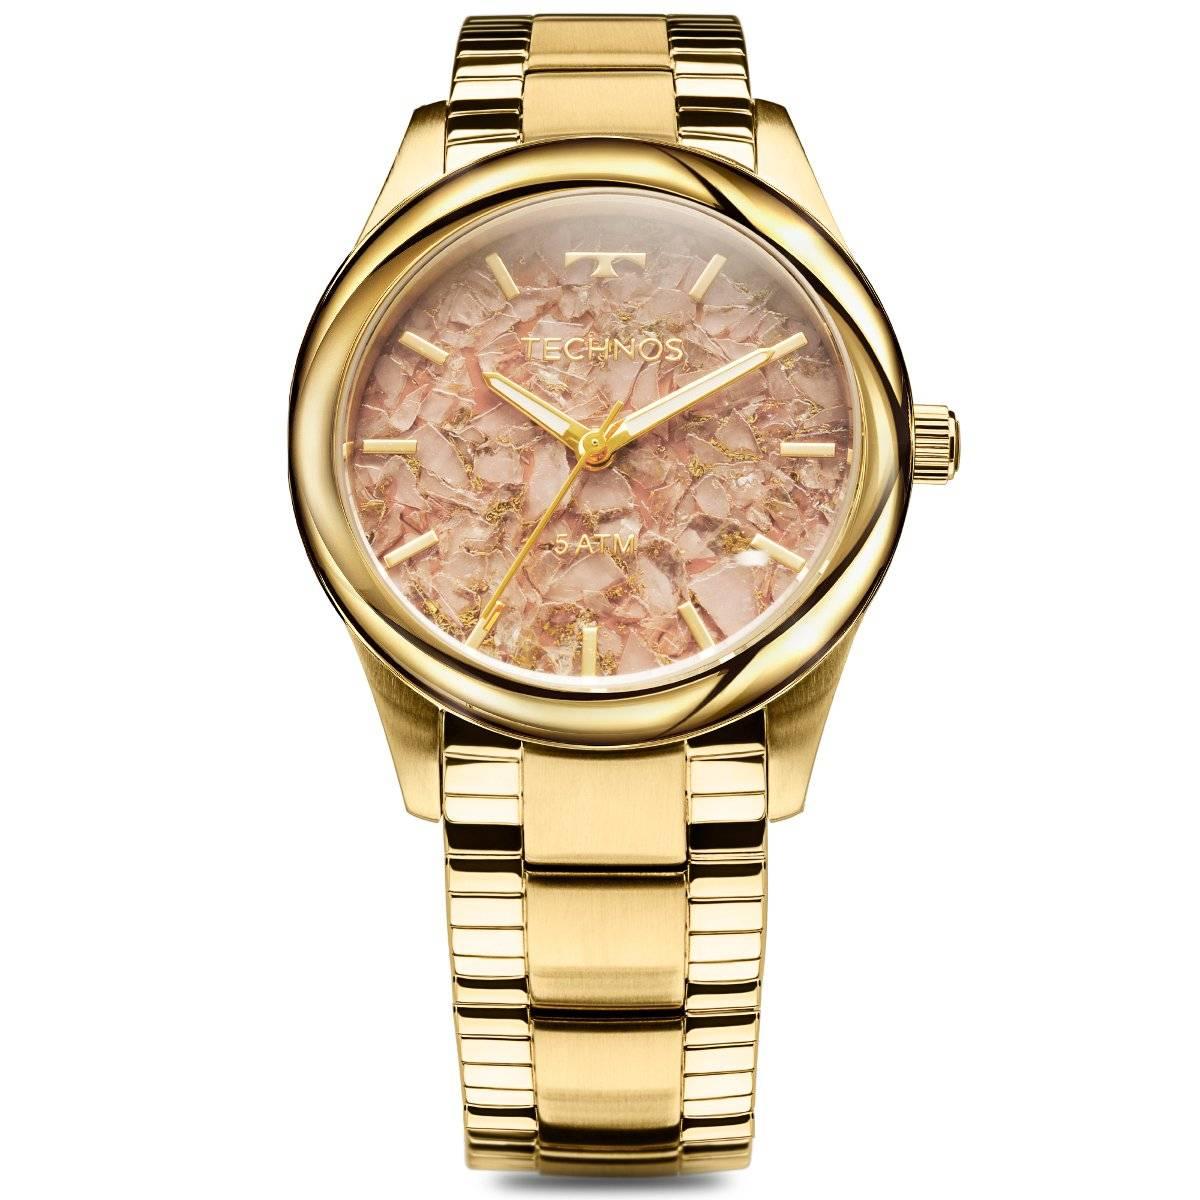 Relógio Technos Elegance Stone Collection Feminino Quartz 2033CN/4T